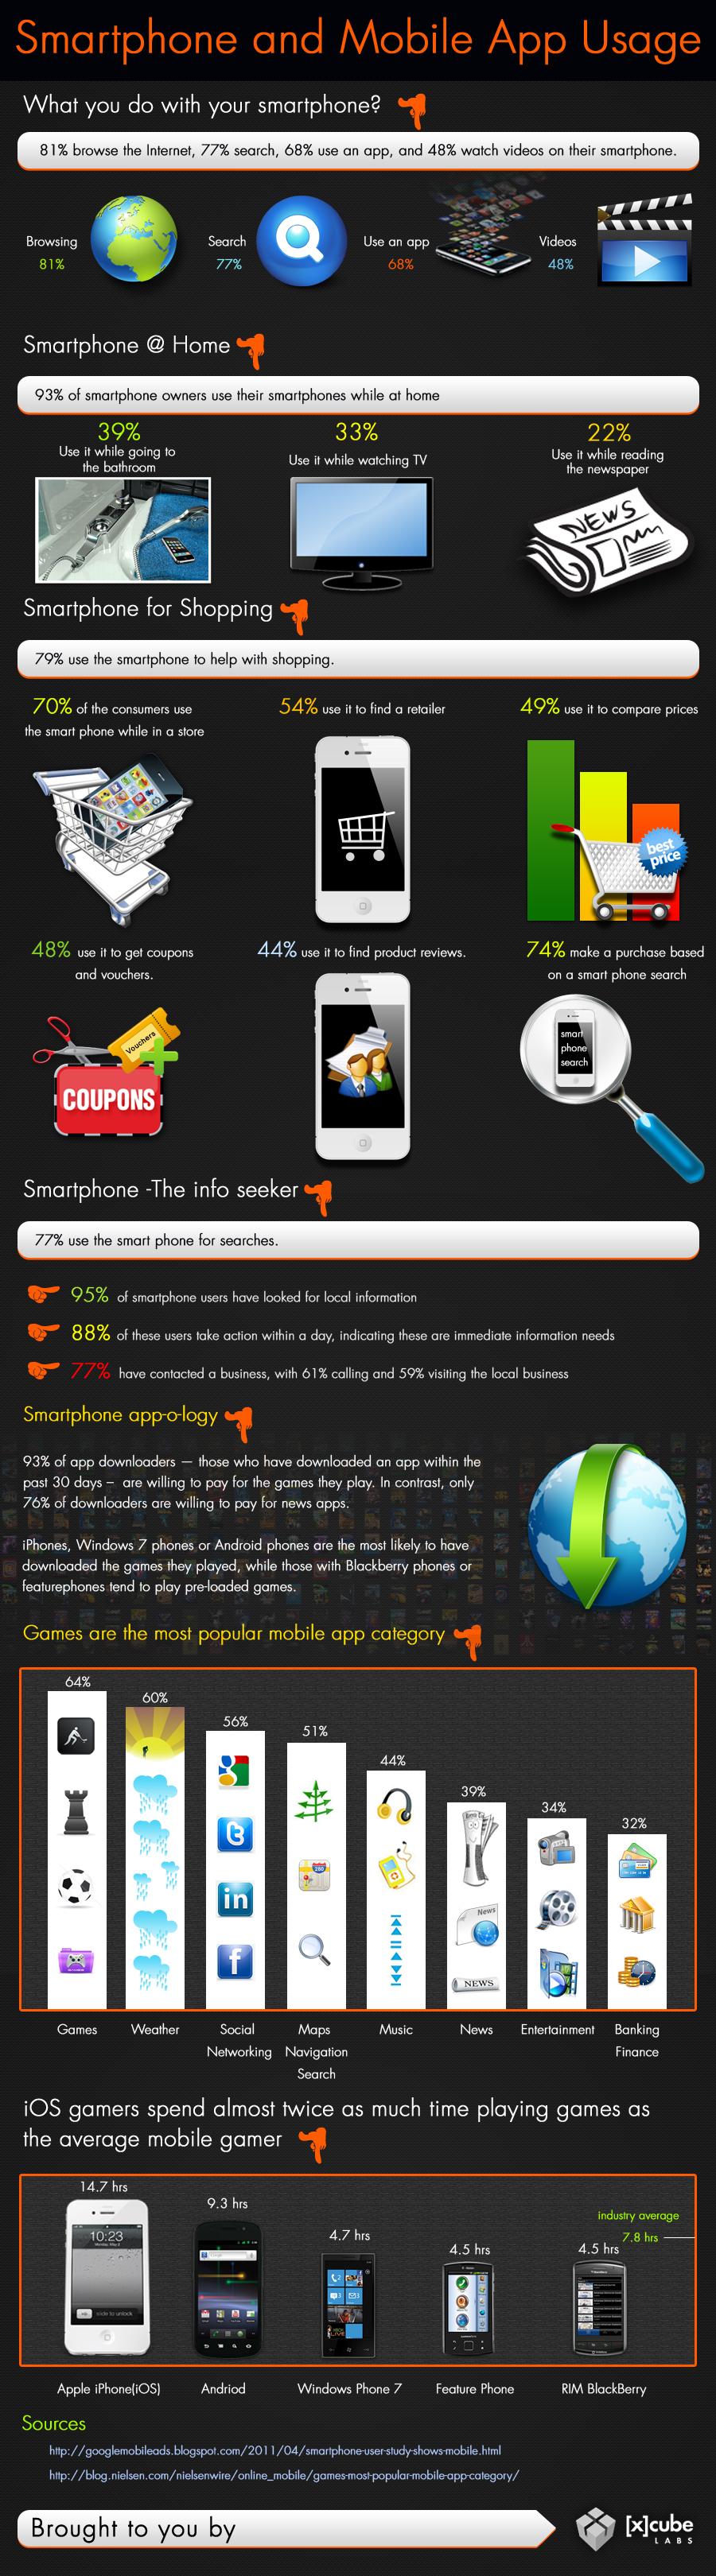 Statistiques sur l'utilisation des smartphones